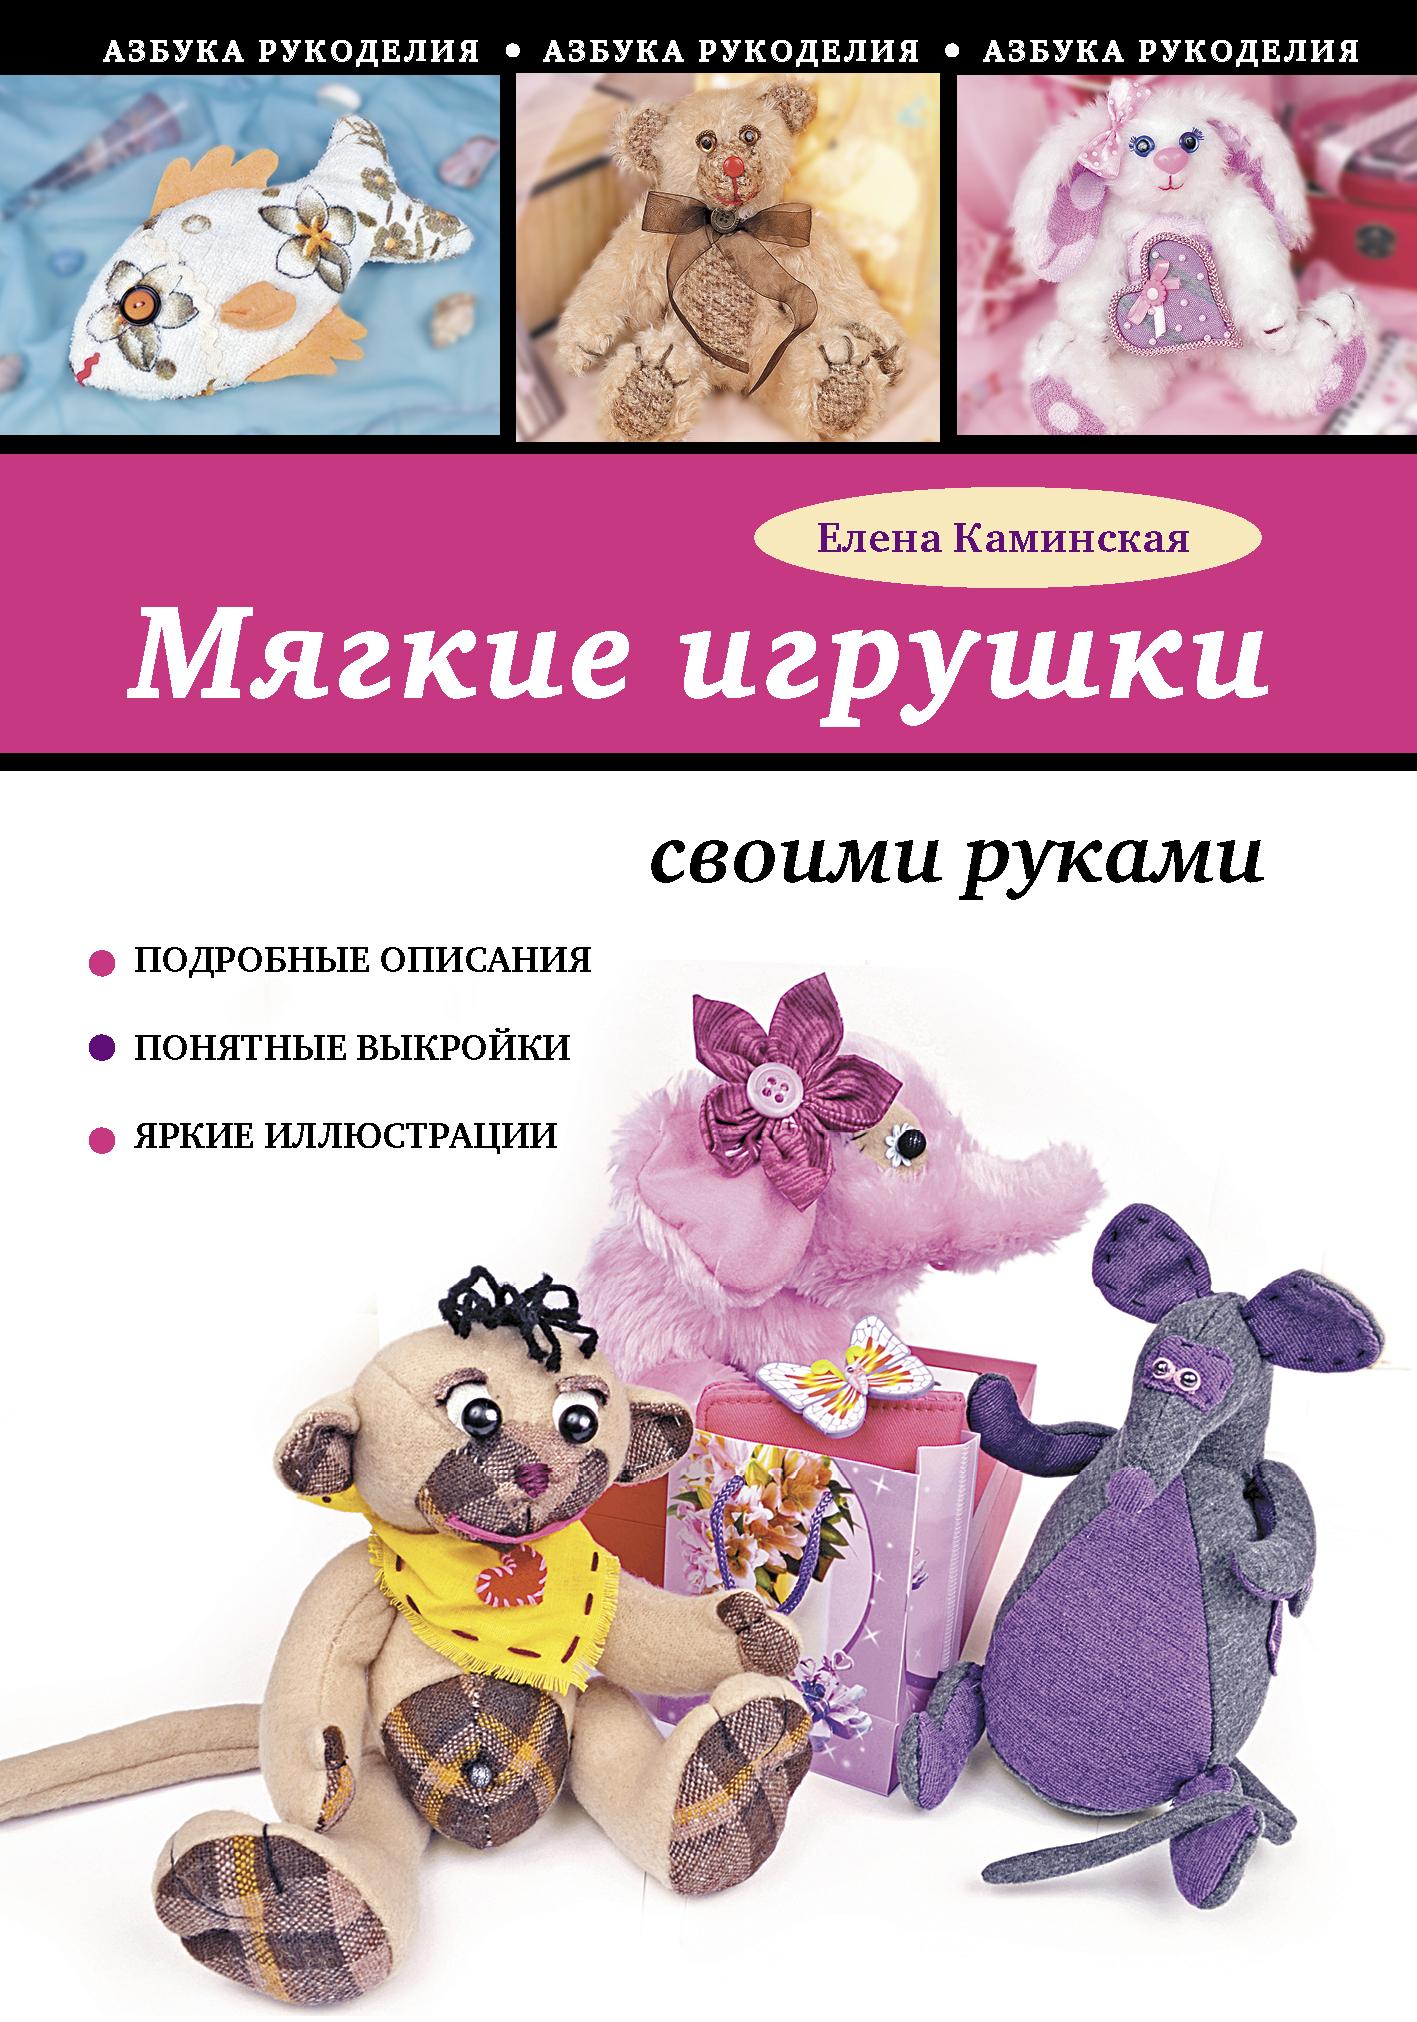 Рукоделие мягкие игрушки своими руками